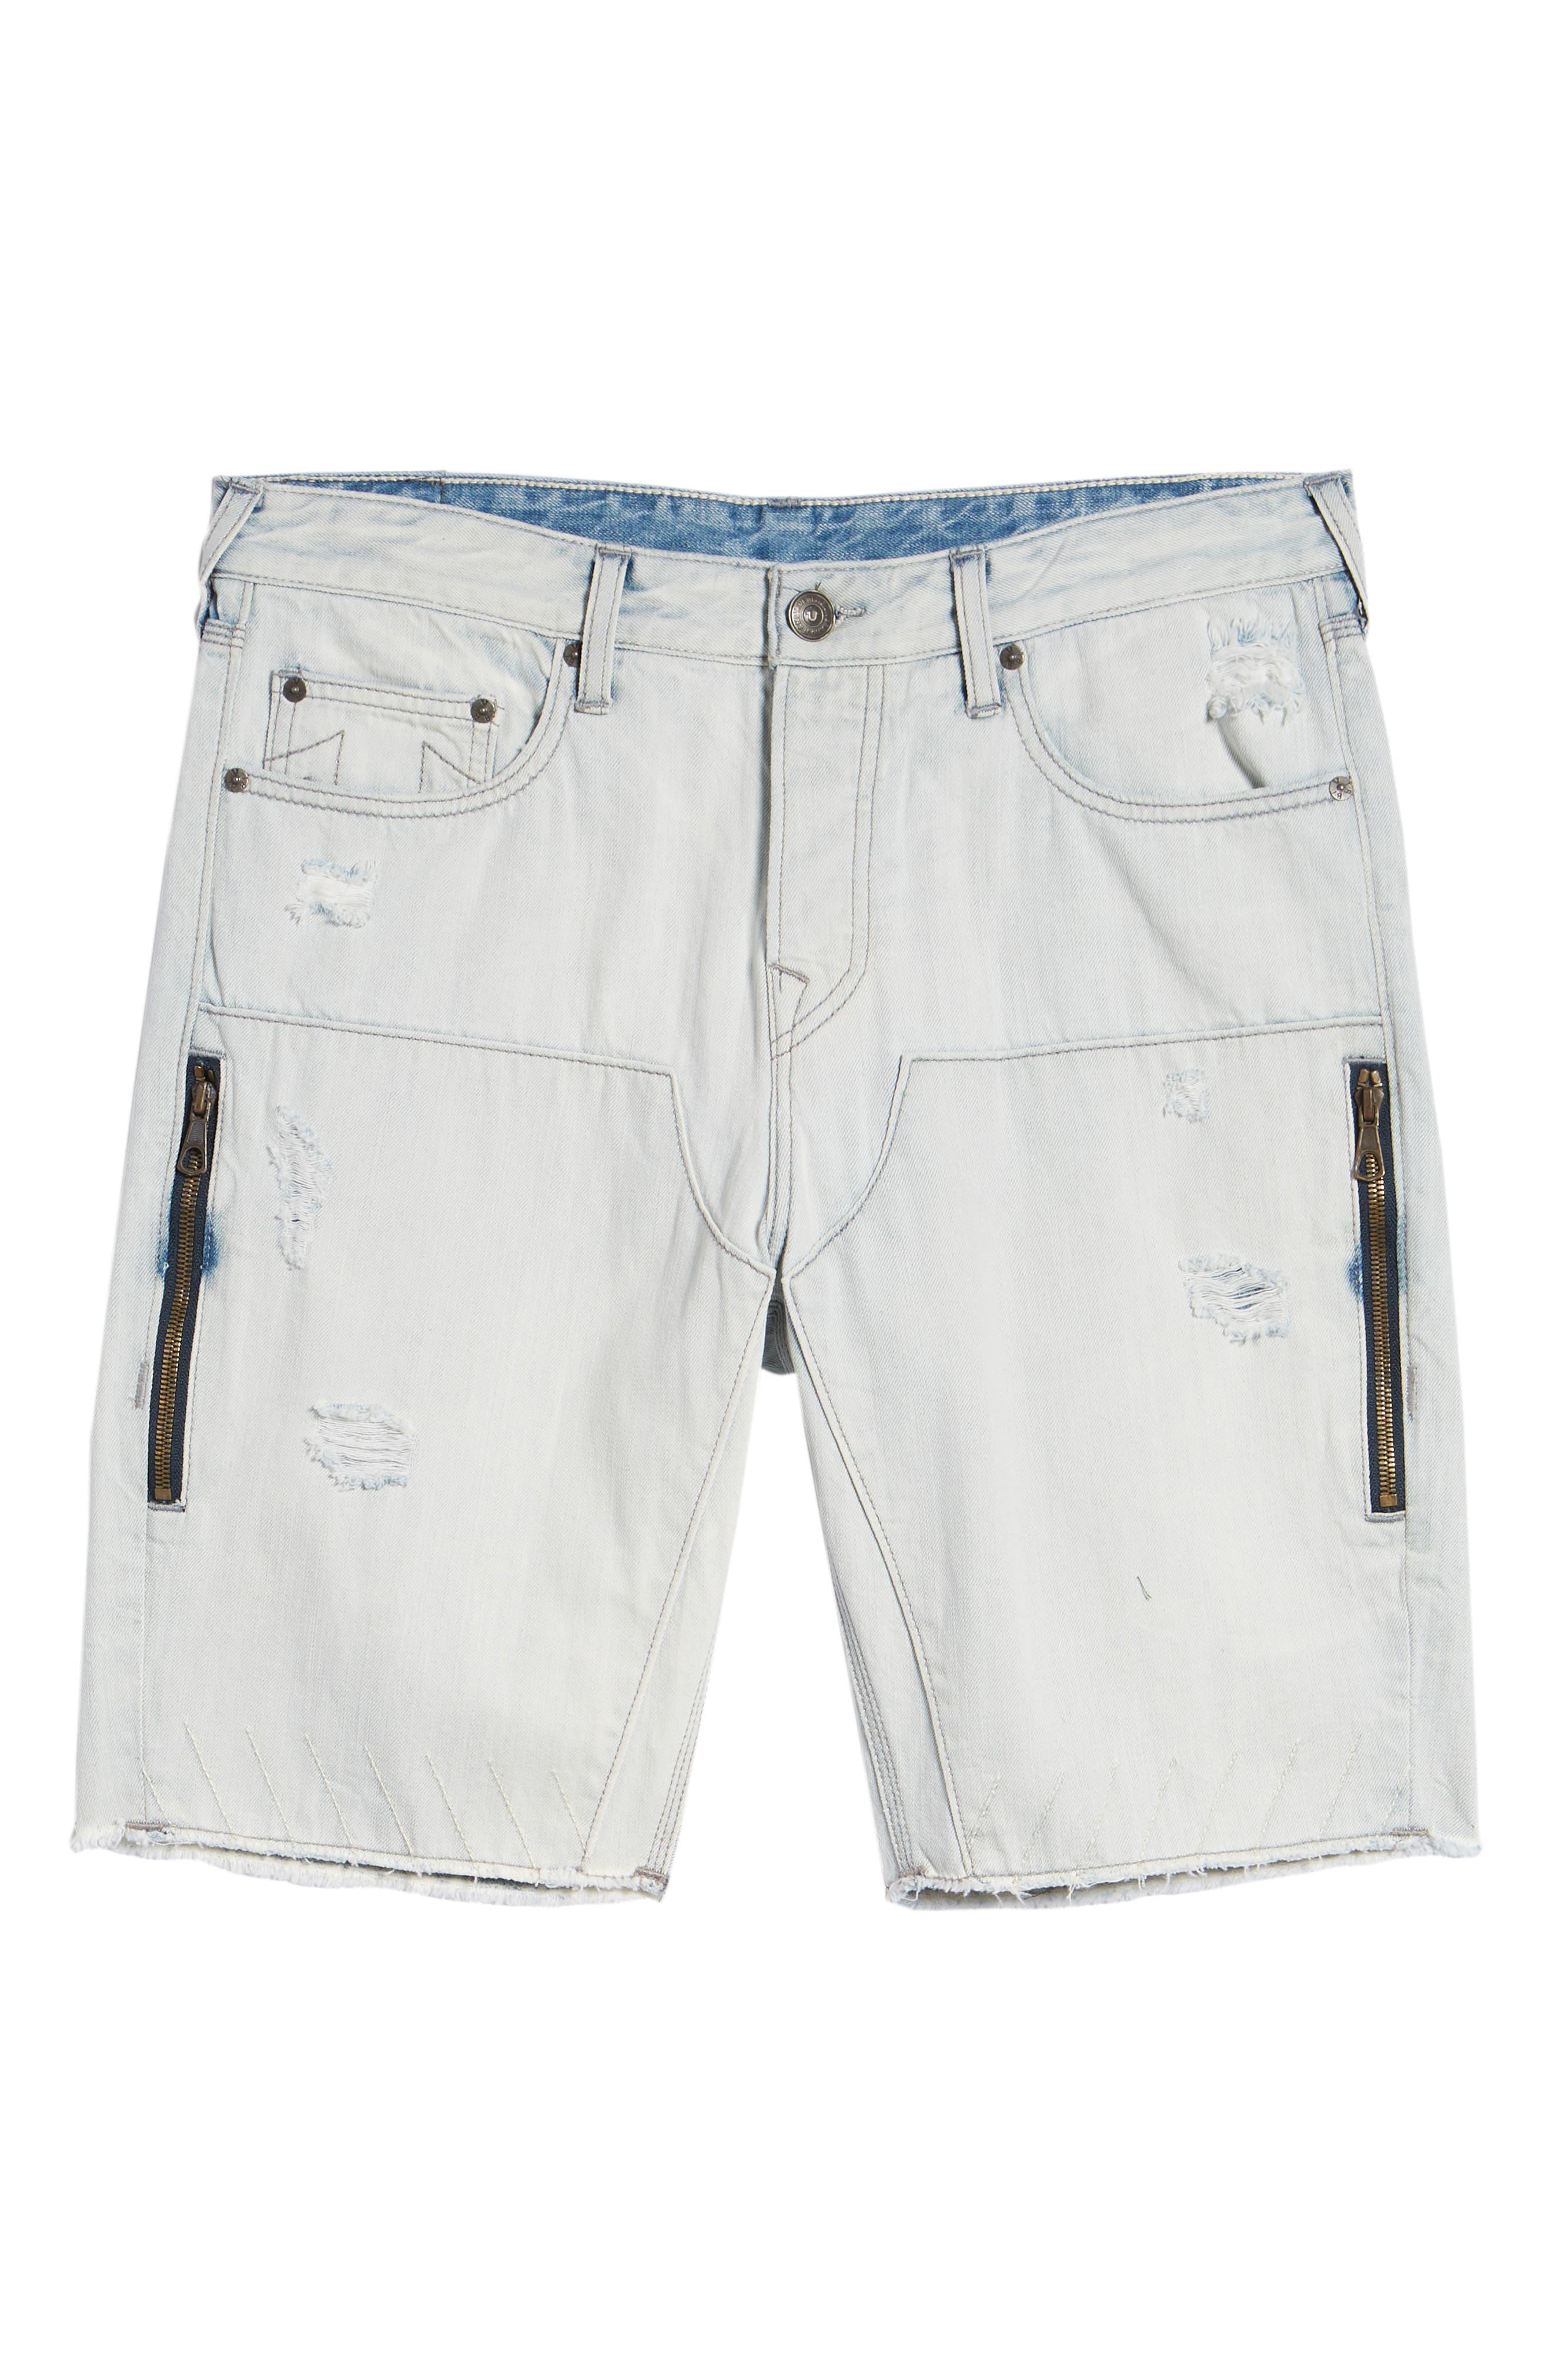 Field Shorts,                             Alternate thumbnail 6, color,                             Upstate